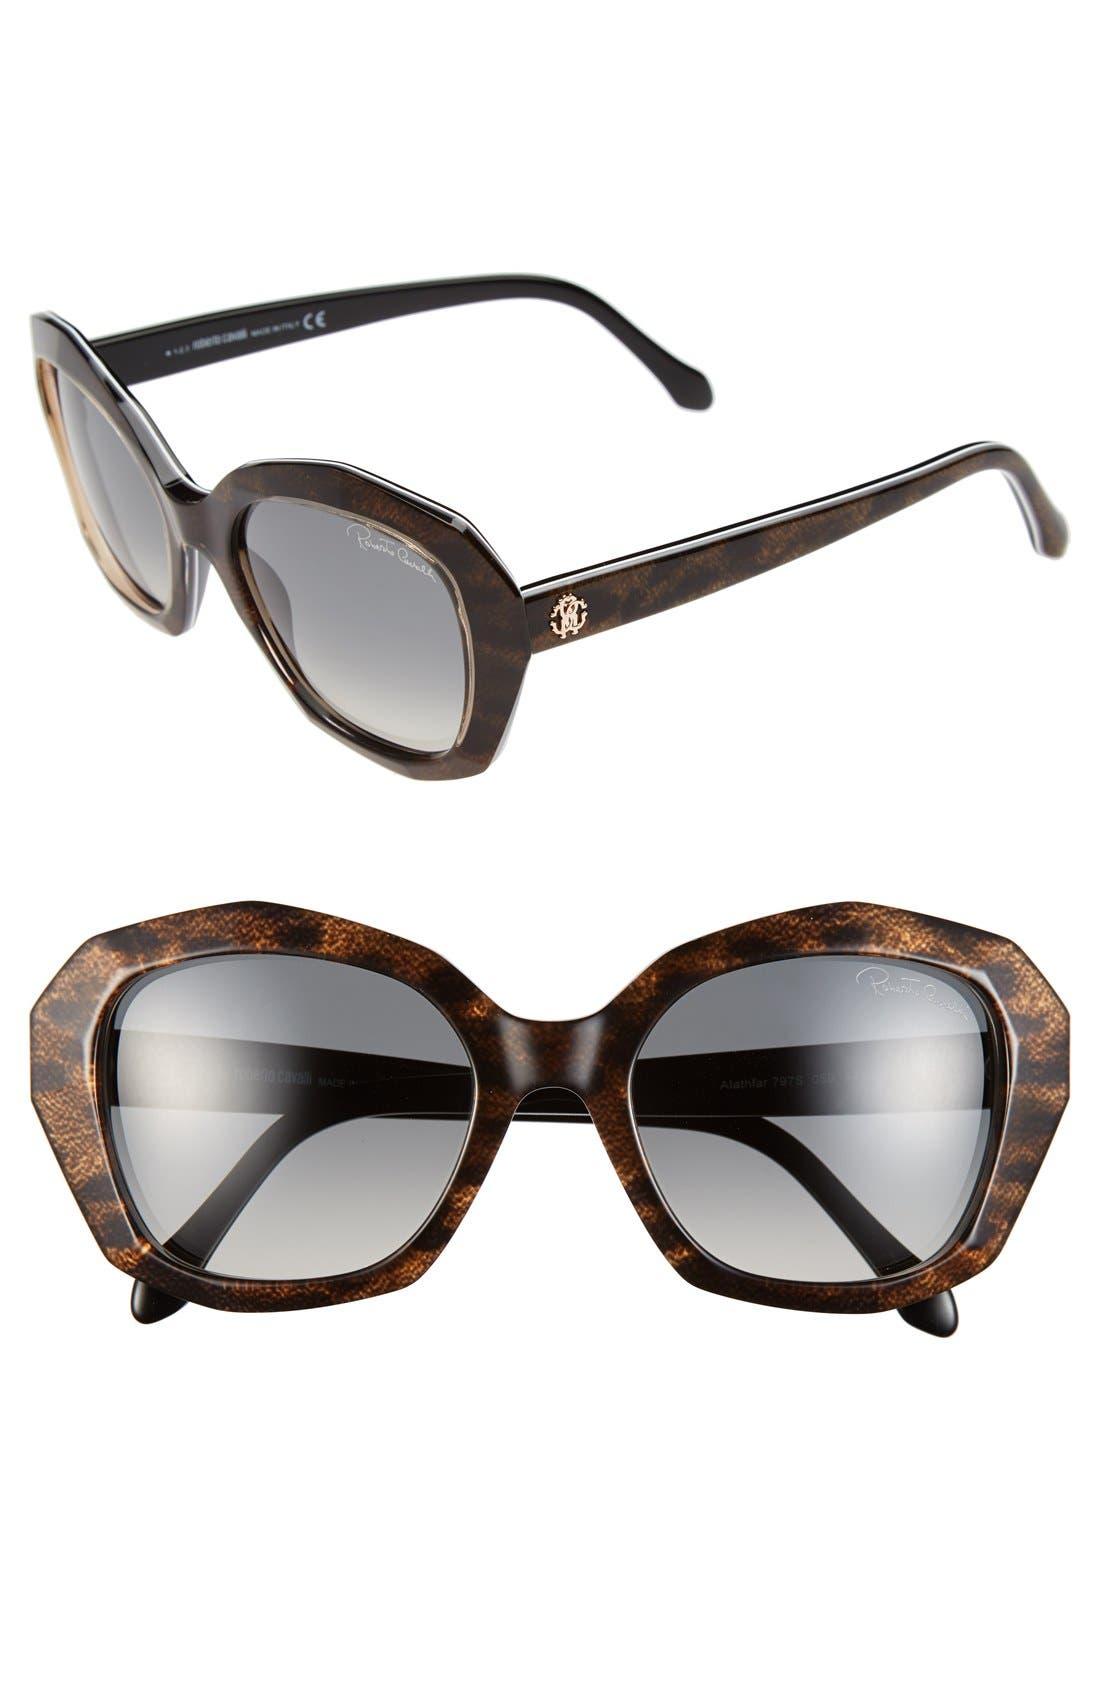 Main Image - Roberto Cavalli 'Alathfar' 54mm Sunglasses